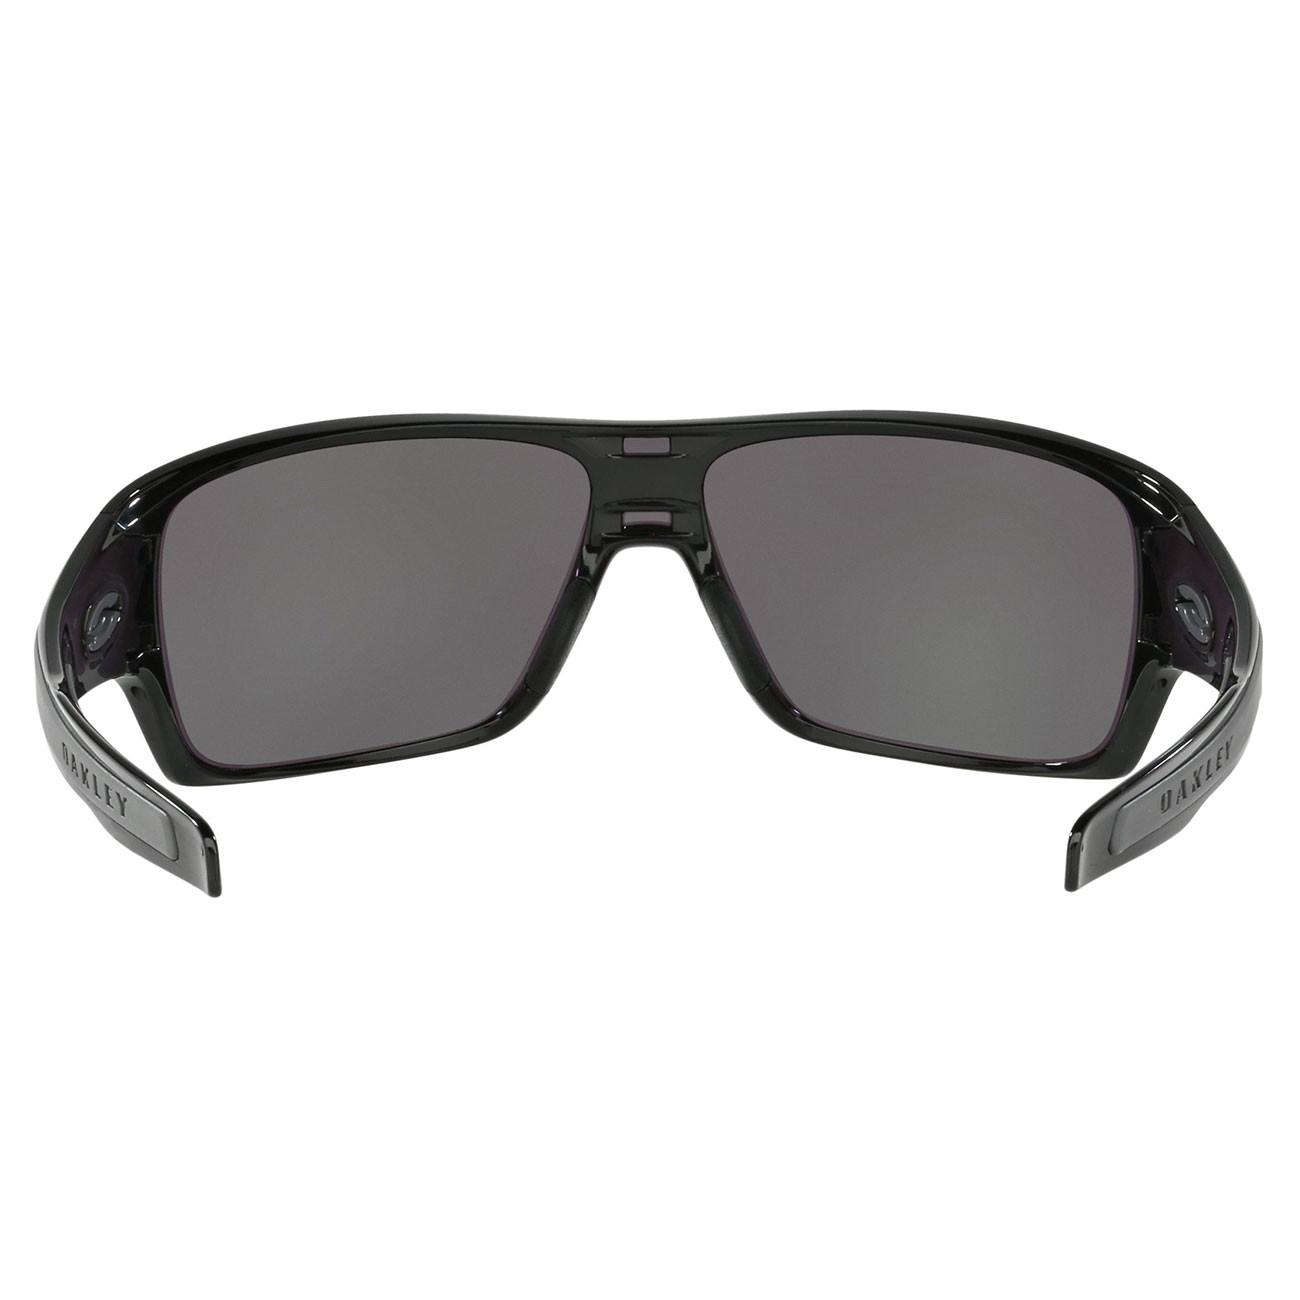 371c0e3dd Slnečné okuliare Oakley Turbine Rotor polished black | Snowboard Zezula